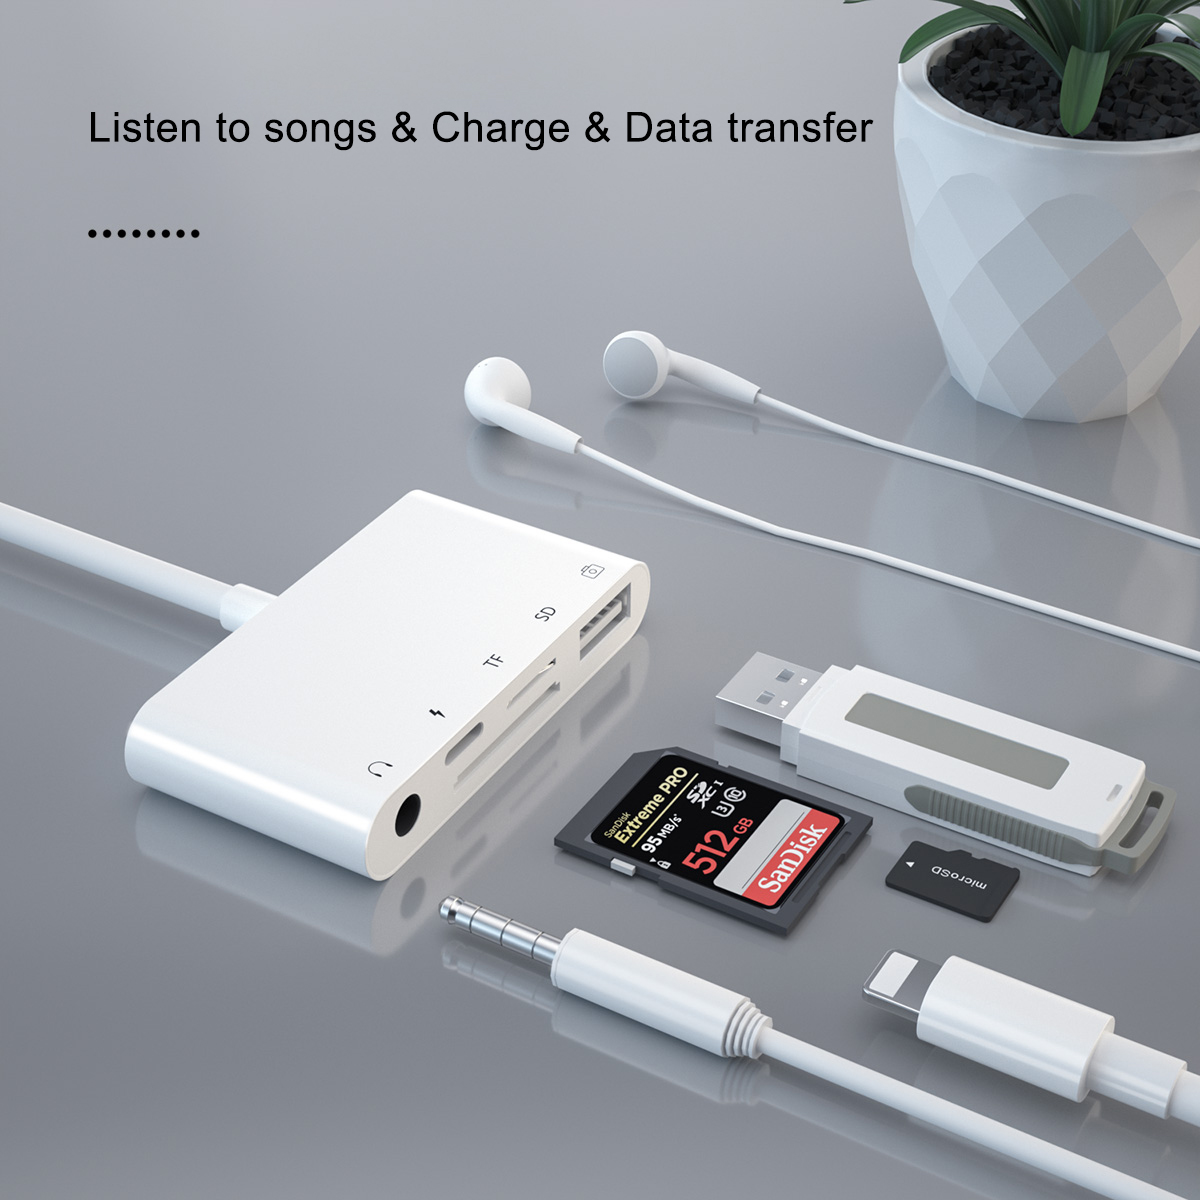 5 Port Card Reader Light ning USB SD card reader multiport 3.5mm Audio Headphone Jack Adapter all in 1 card reader for iPhone